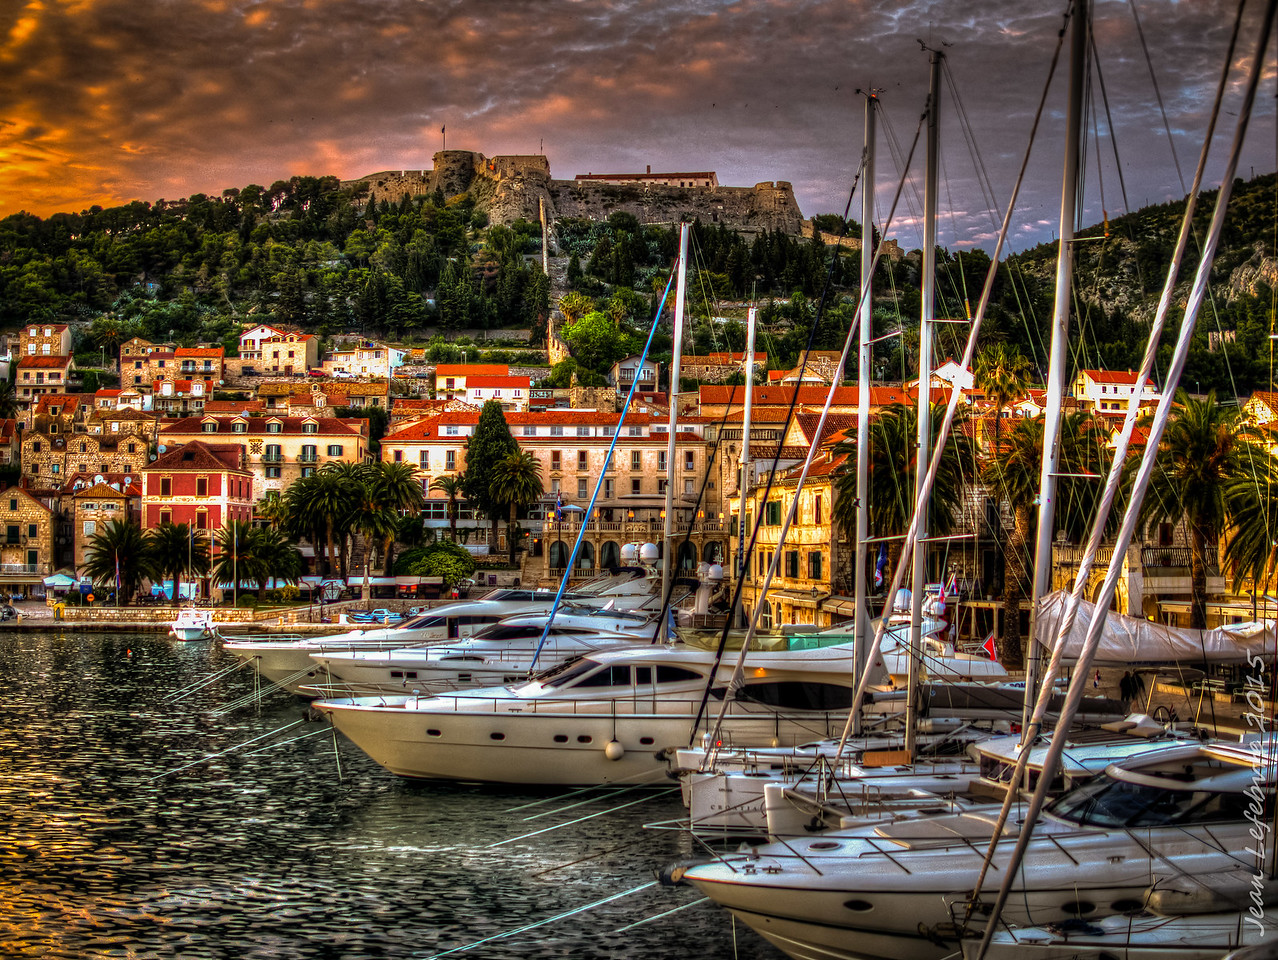 Hvar Harbour at Sunset, Croatia